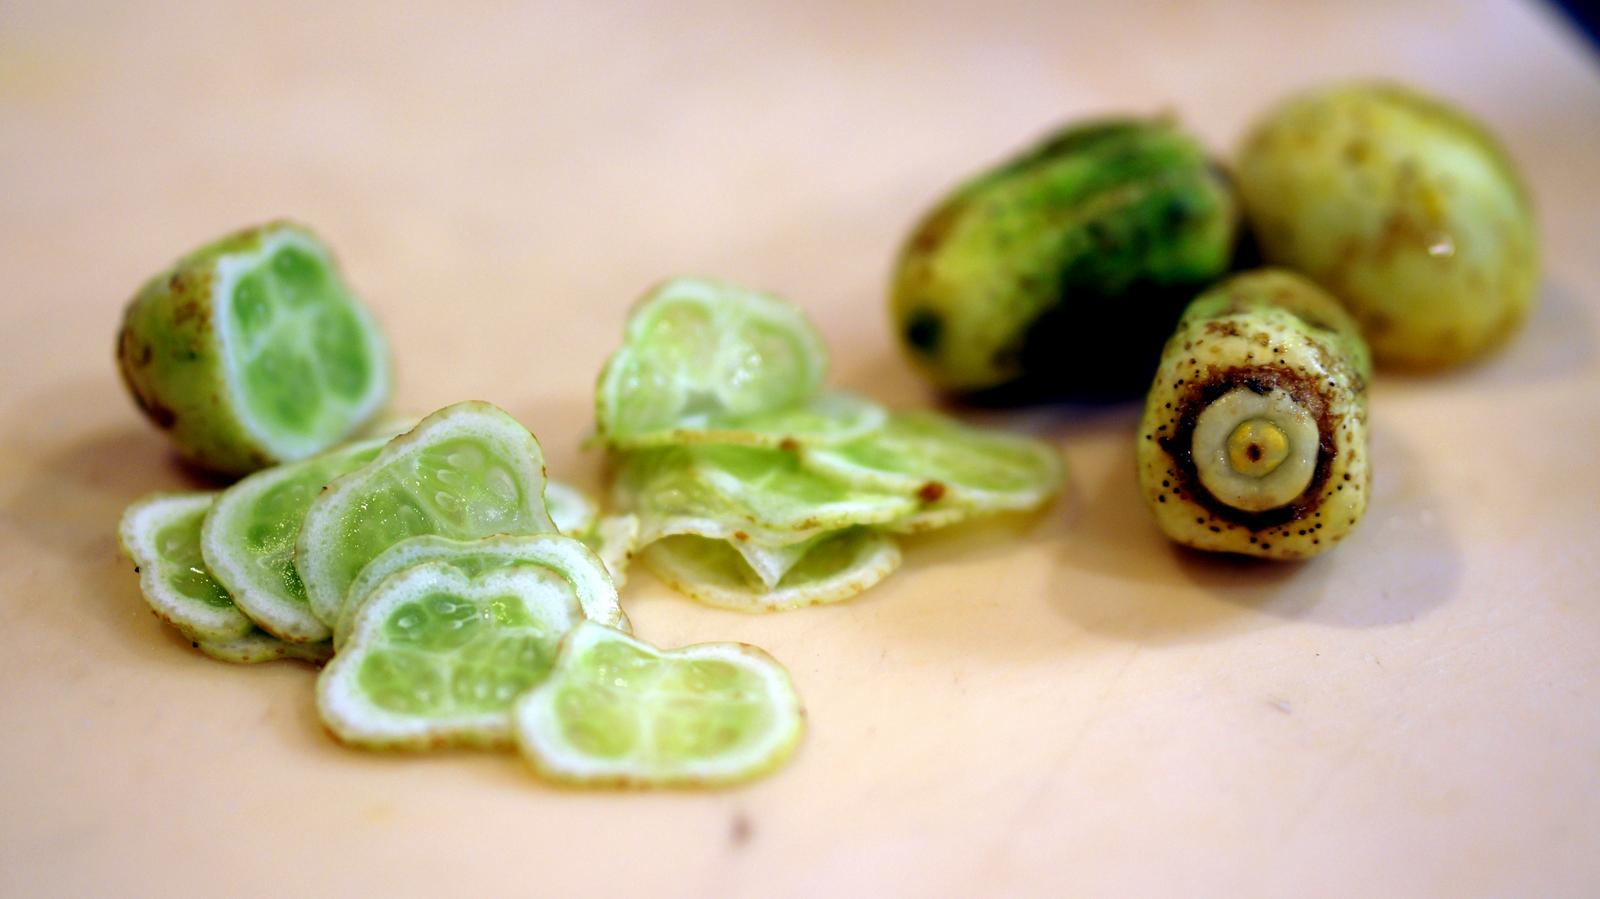 11-2014lemon cucumbers from greenstring.jpg